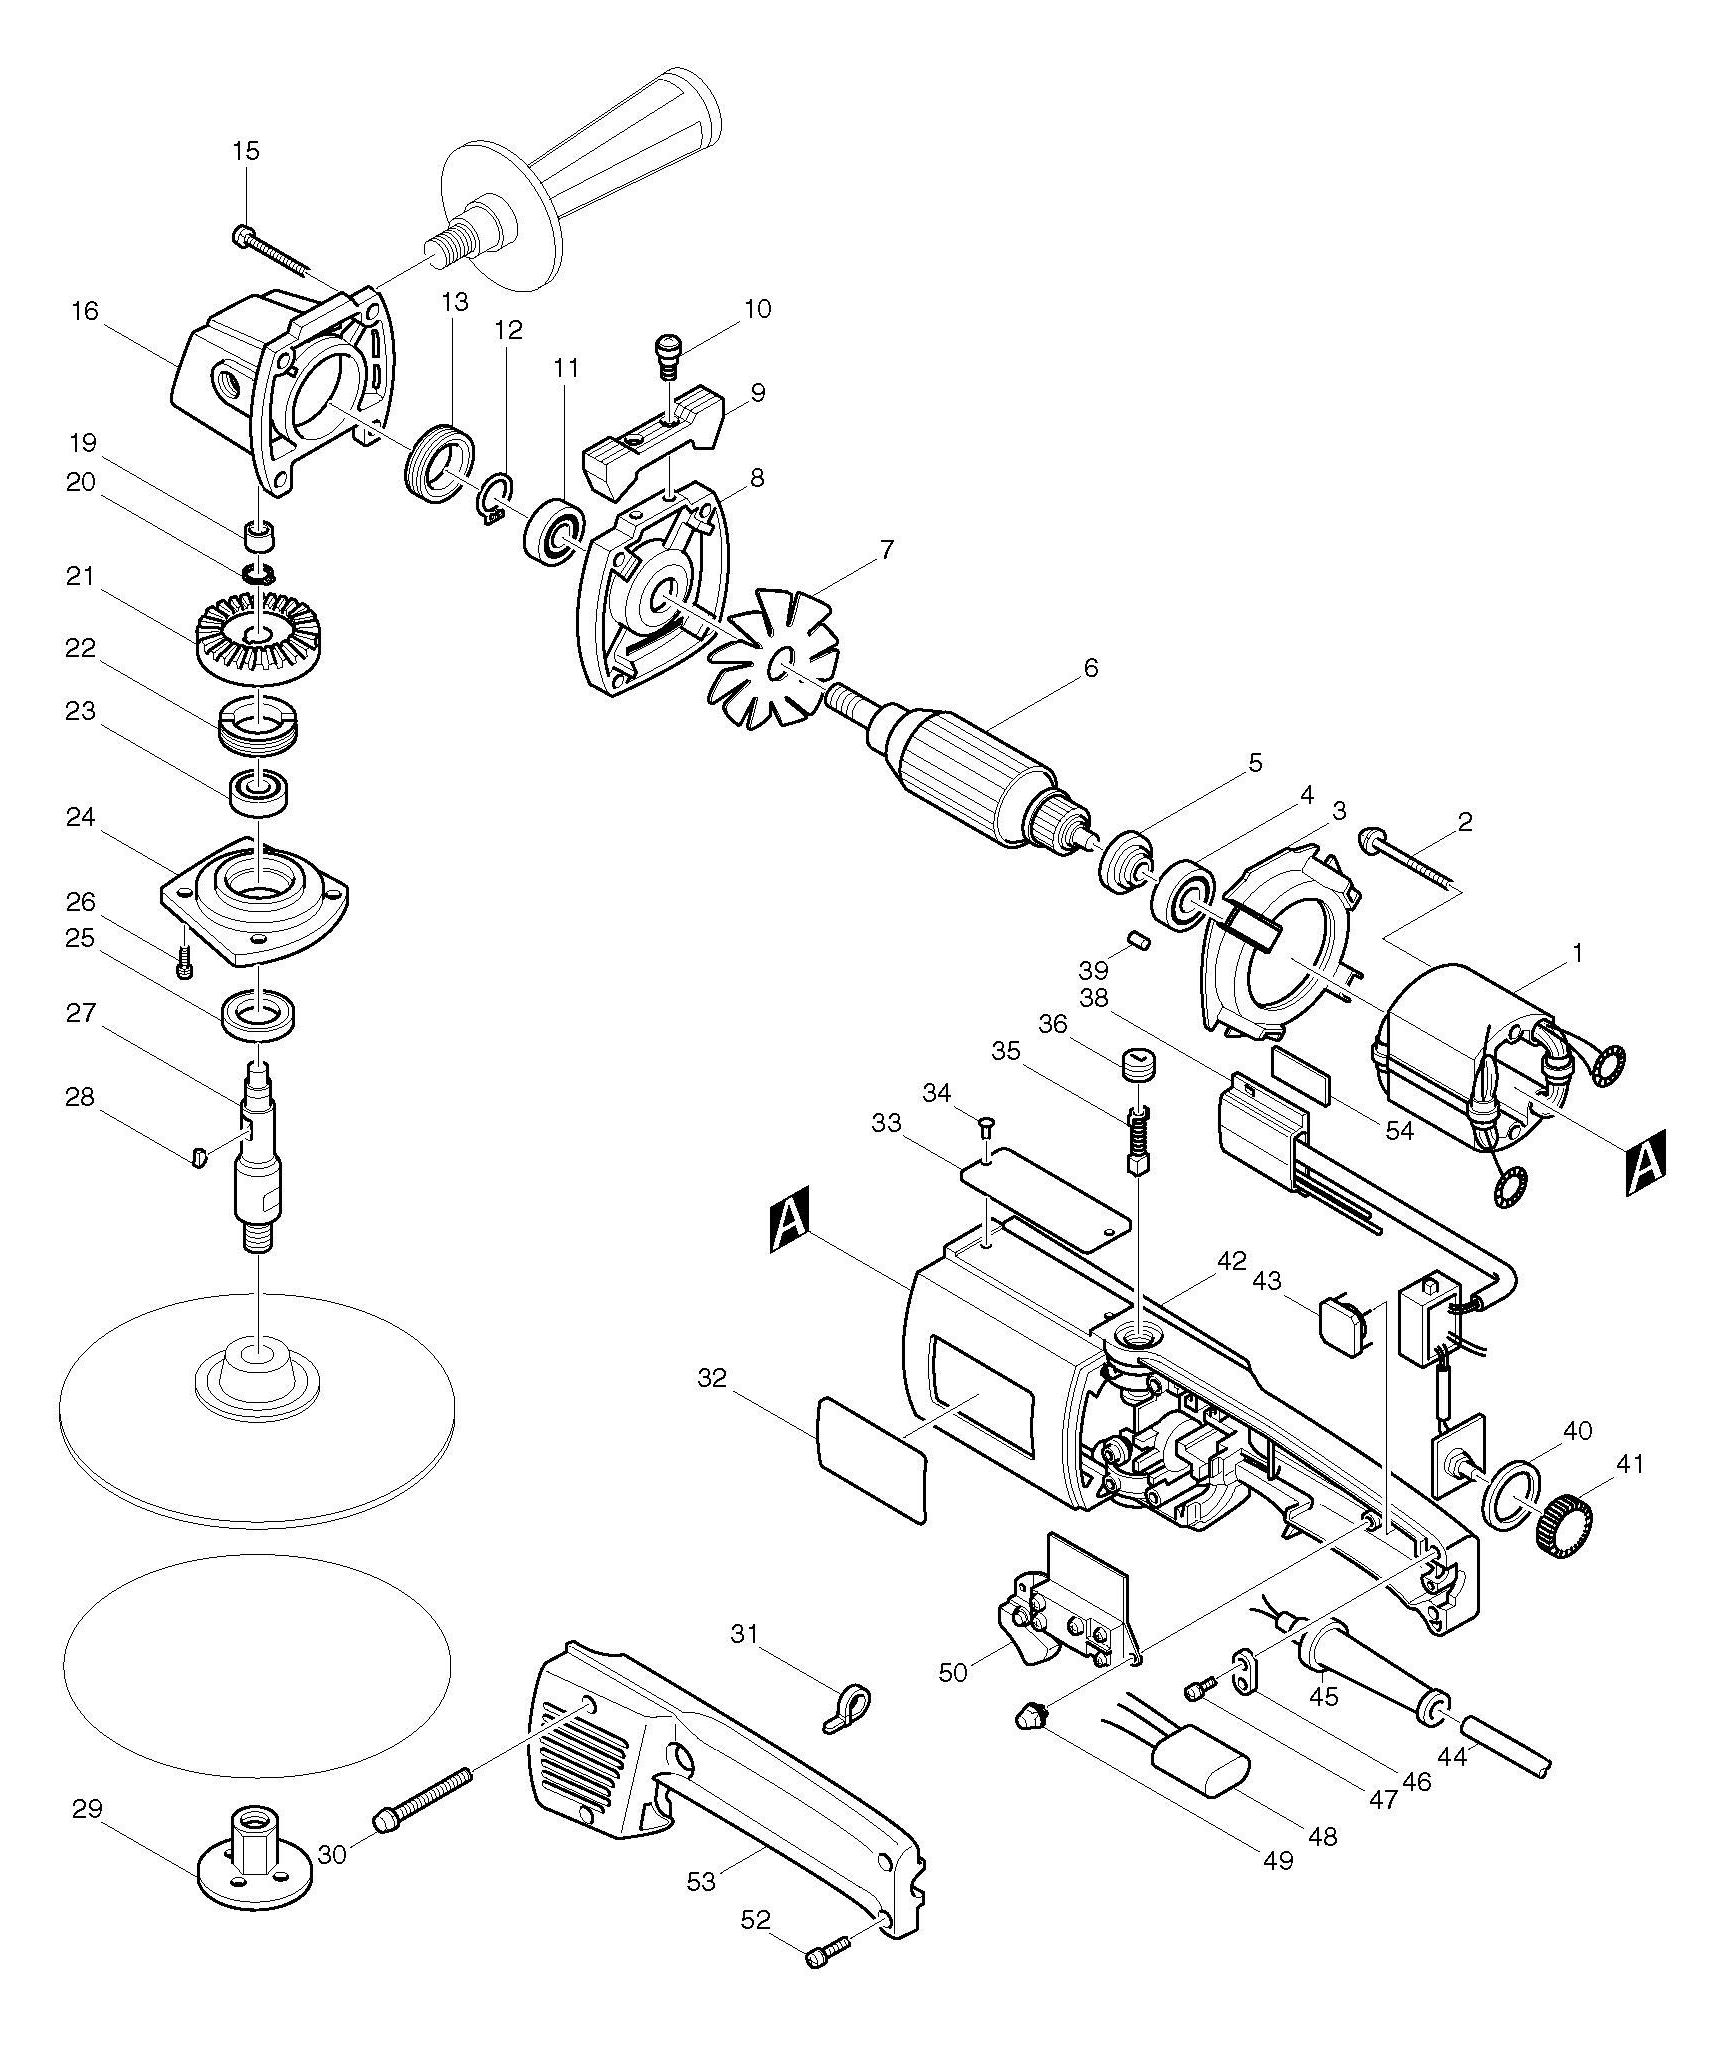 Makita 9227c Wiring Diagram - Catalogue of Schemas on